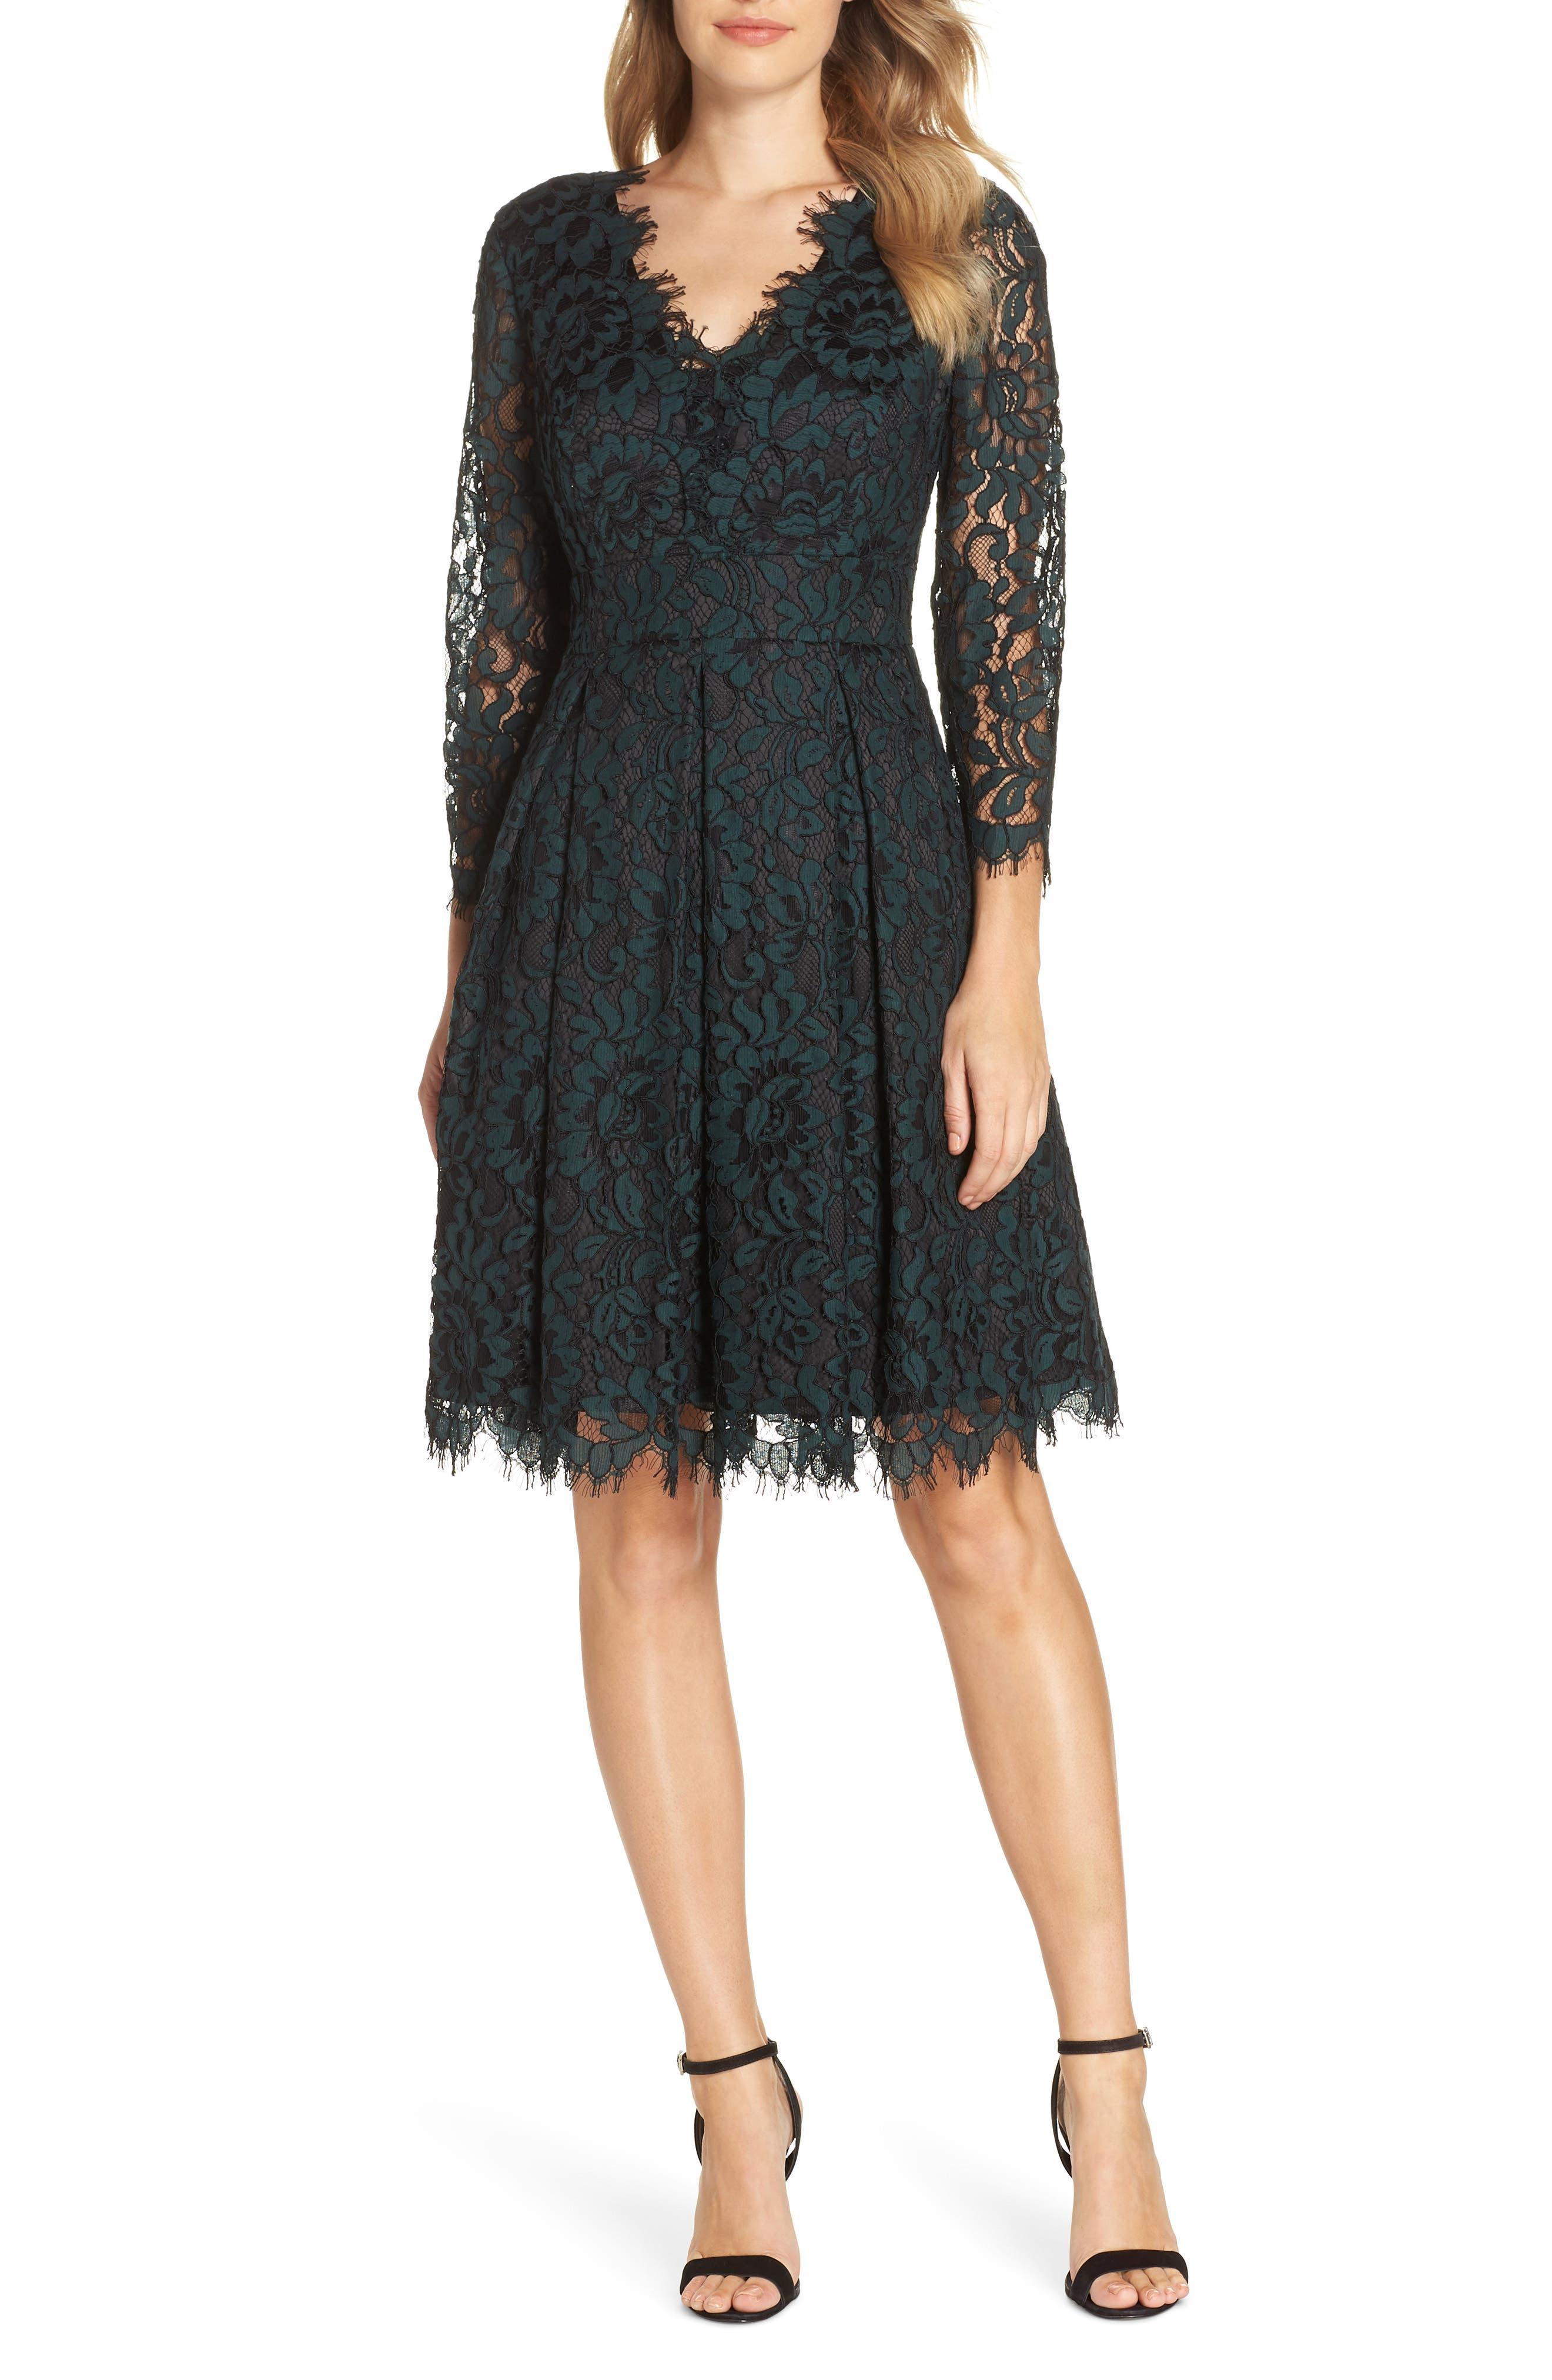 ELIZA J, Lace V-Neck Fit & Flare Dress, Main thumbnail 1, color, 310